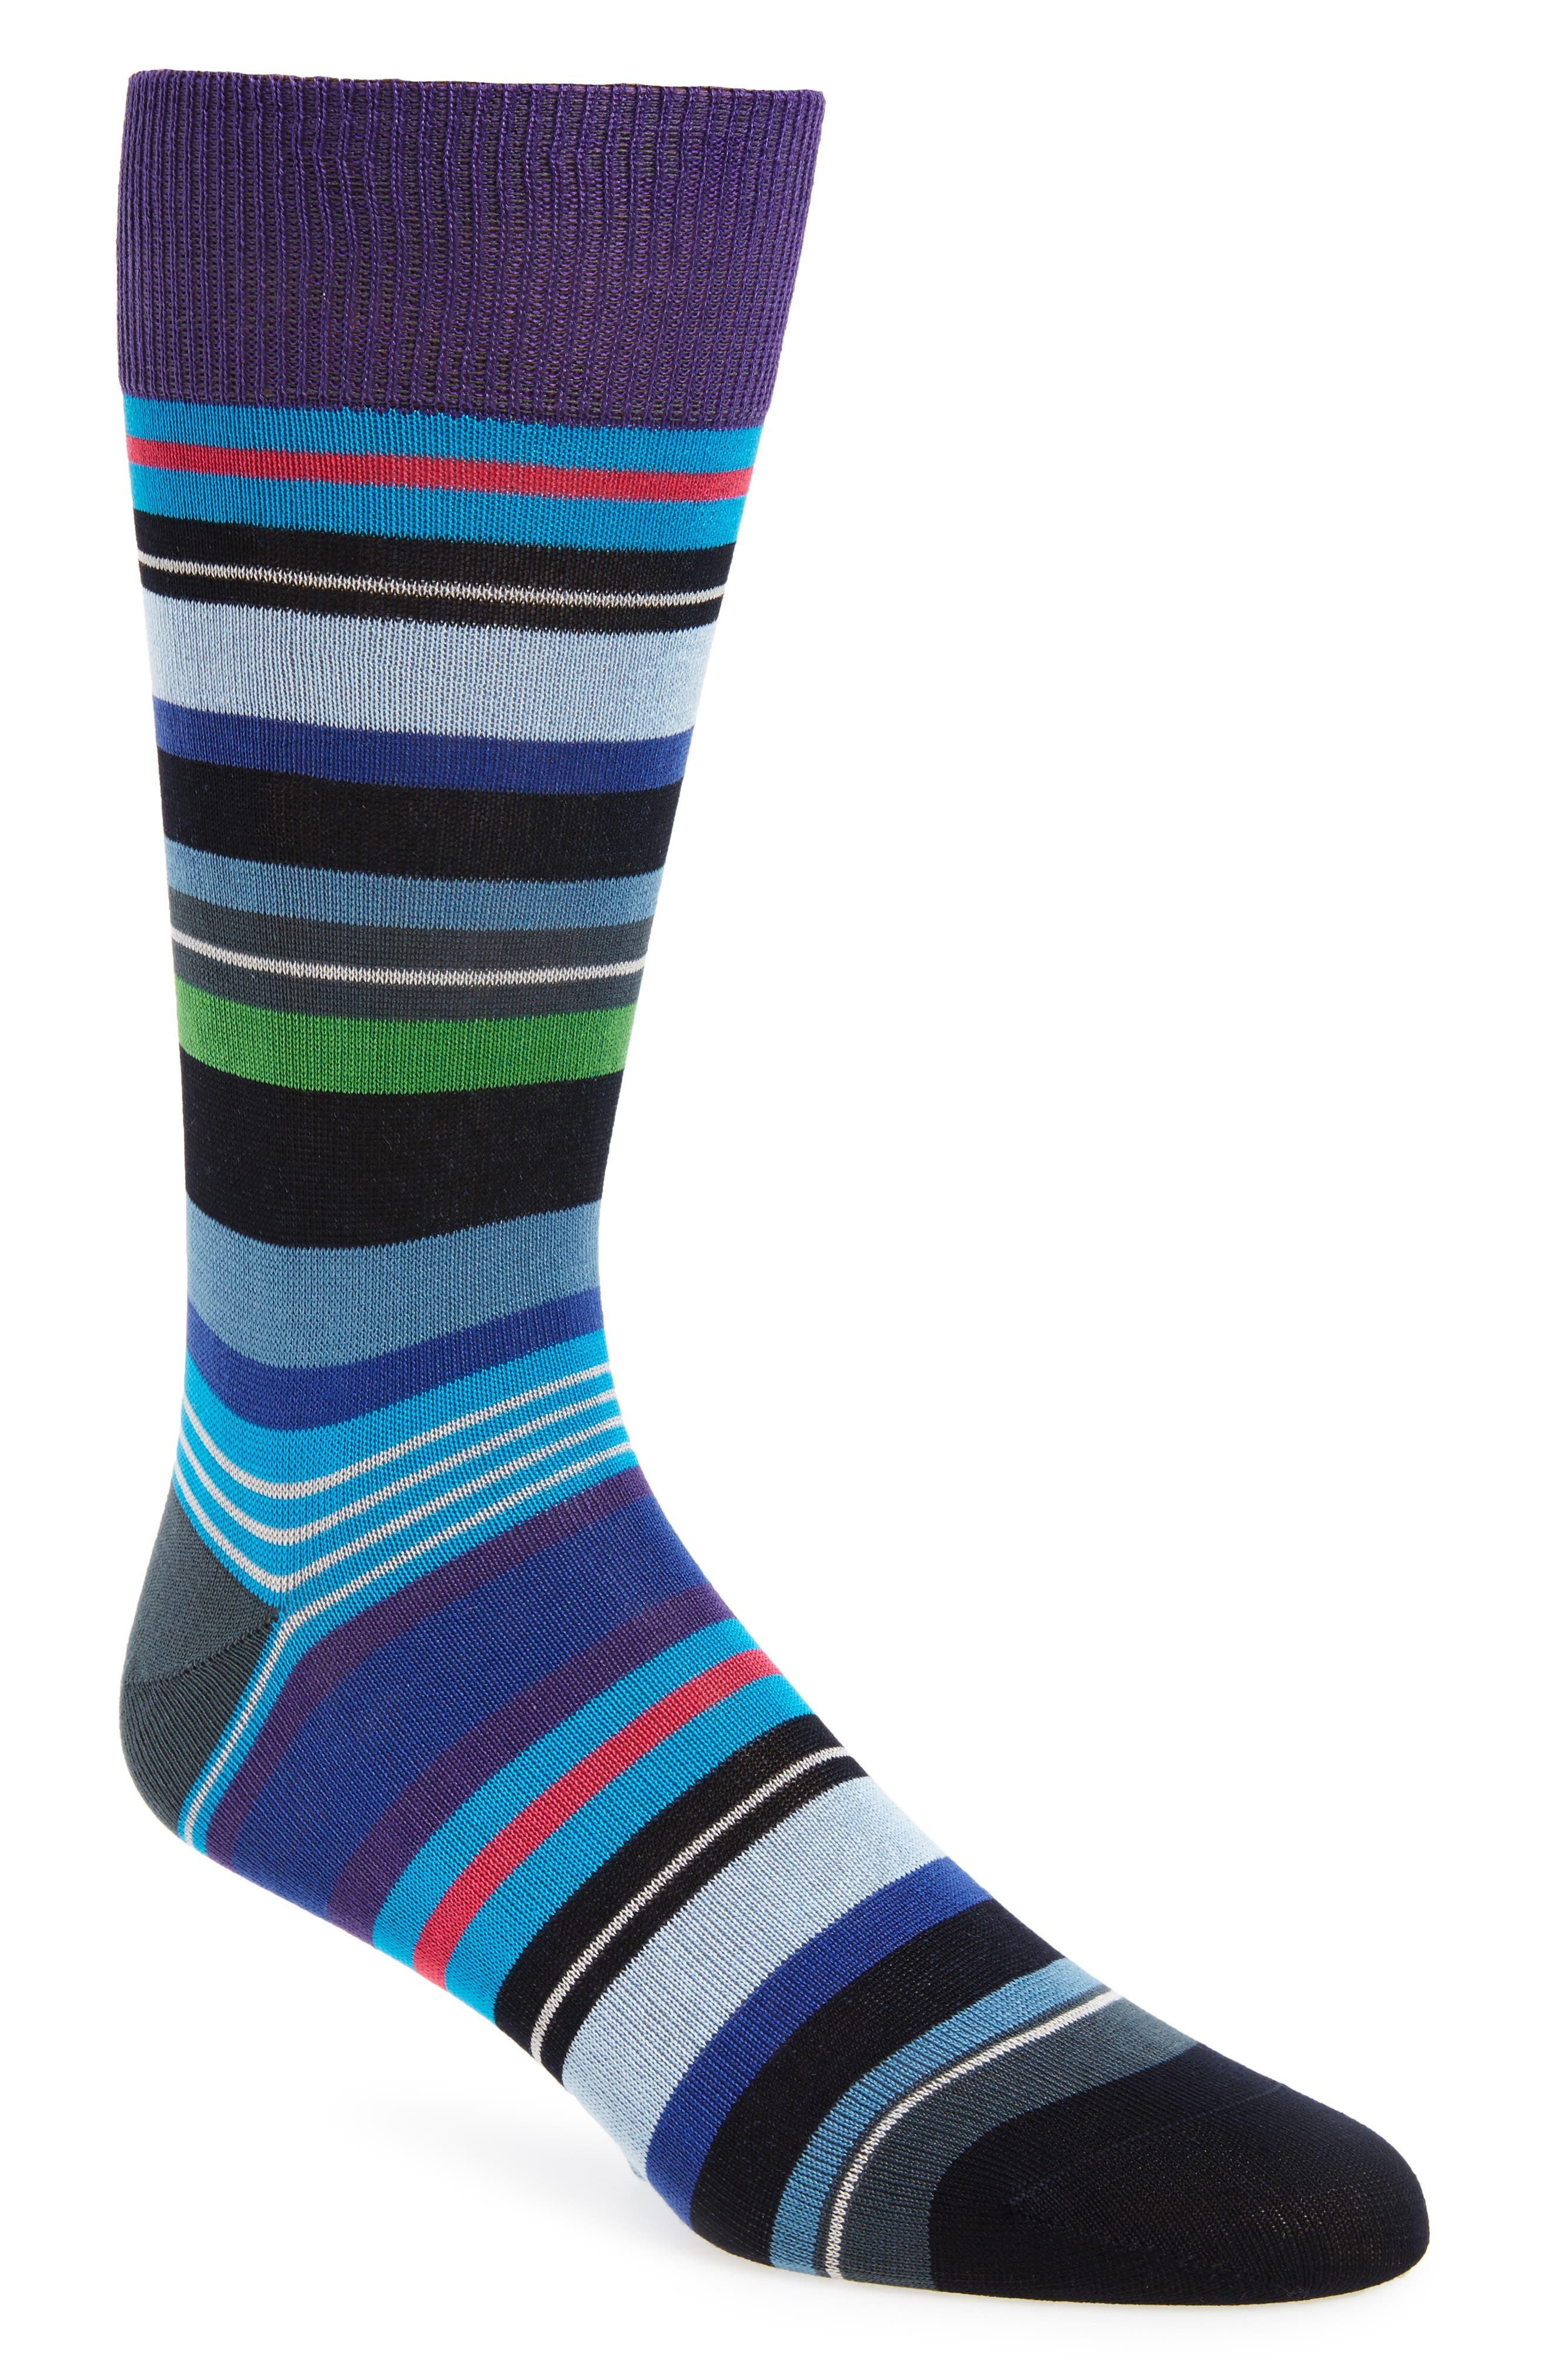 Halentoe Stripe Socks,                         Main,                         color, Blue